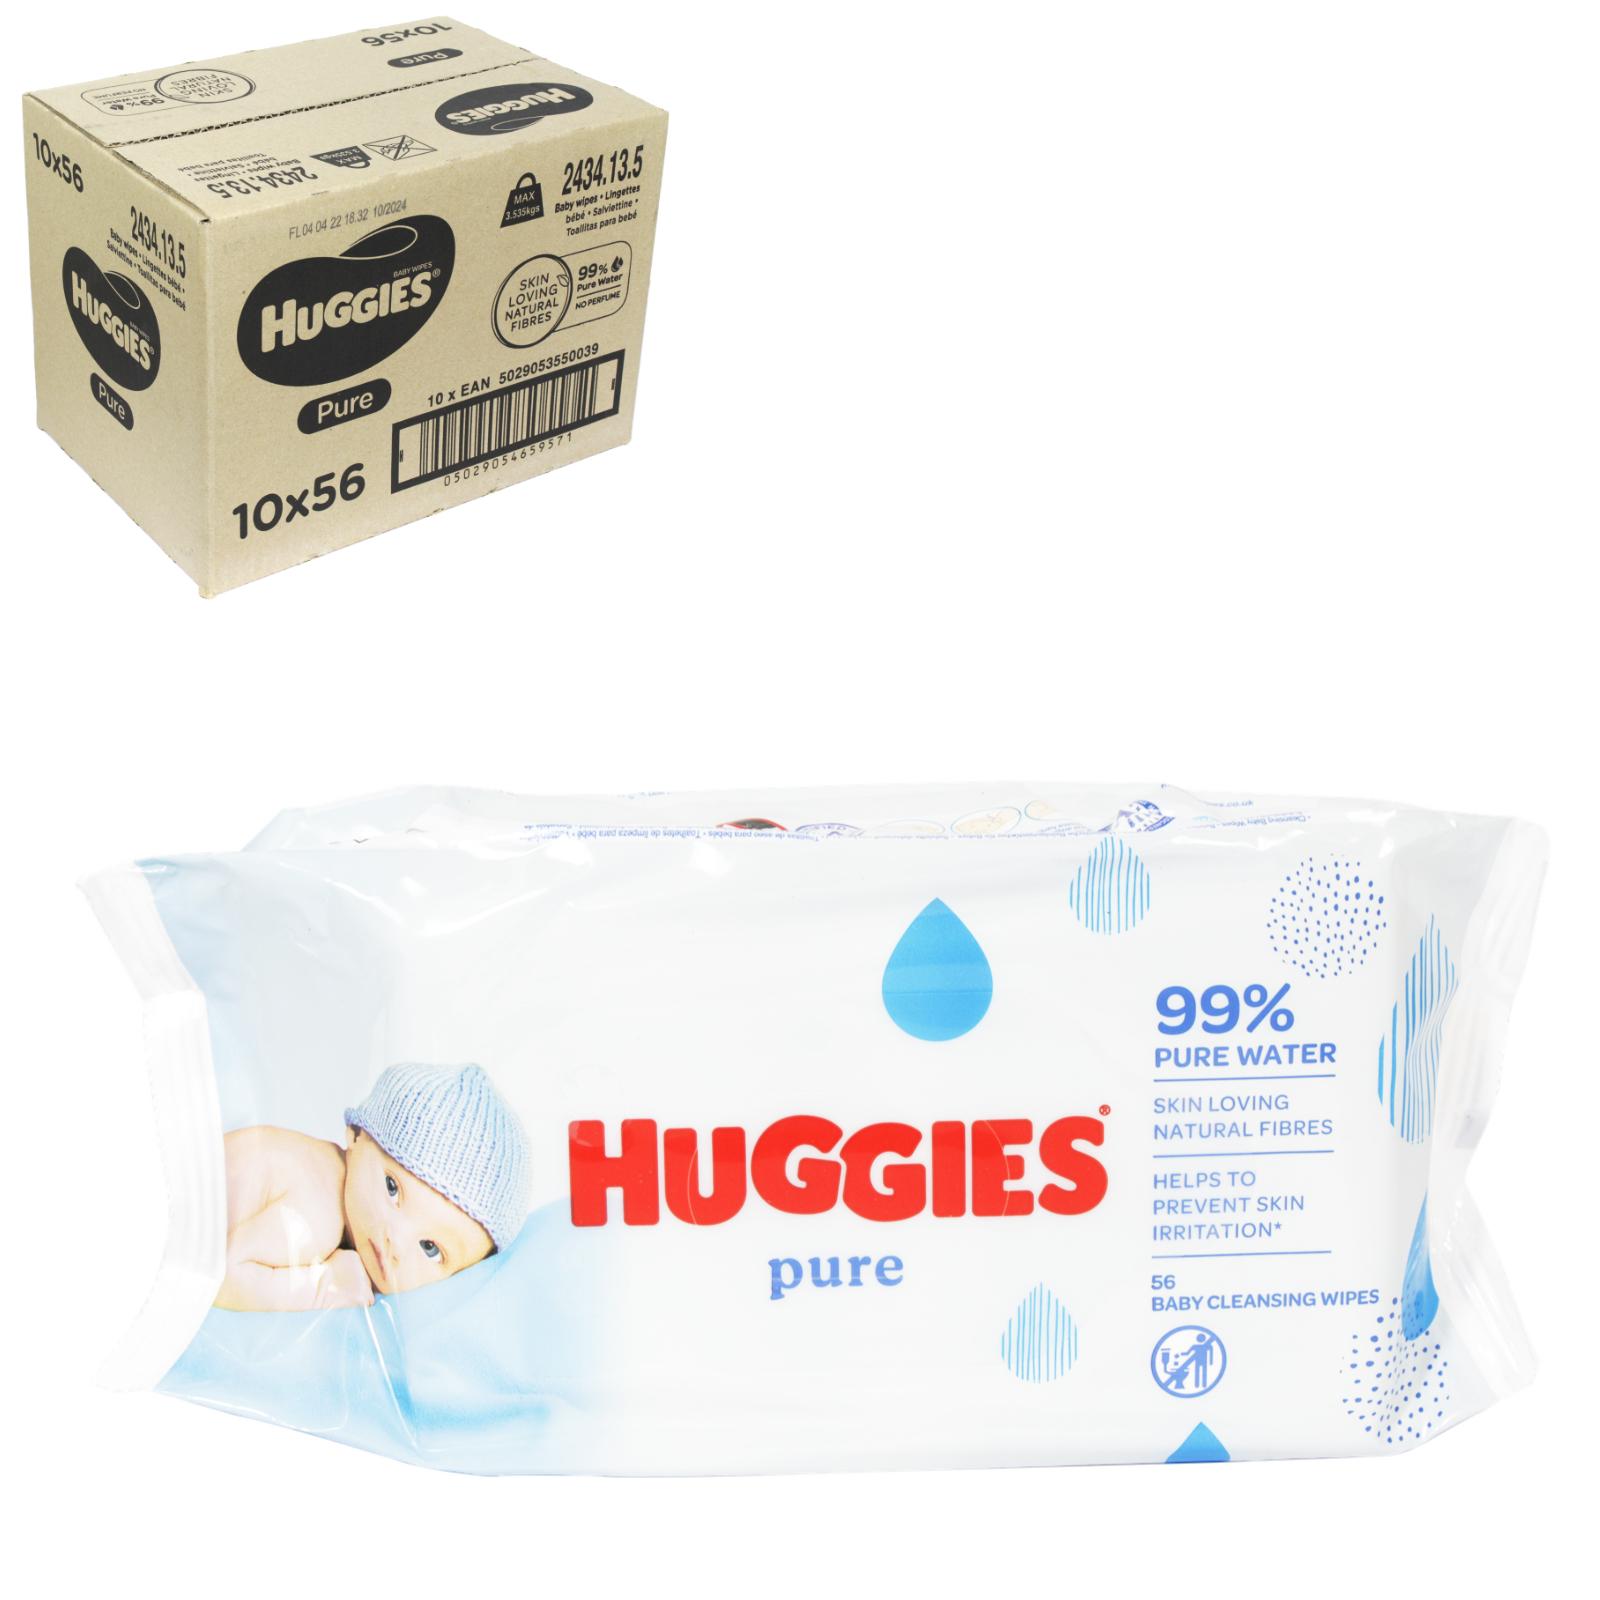 HUGGIES BABY WIPES 56S PURE X12